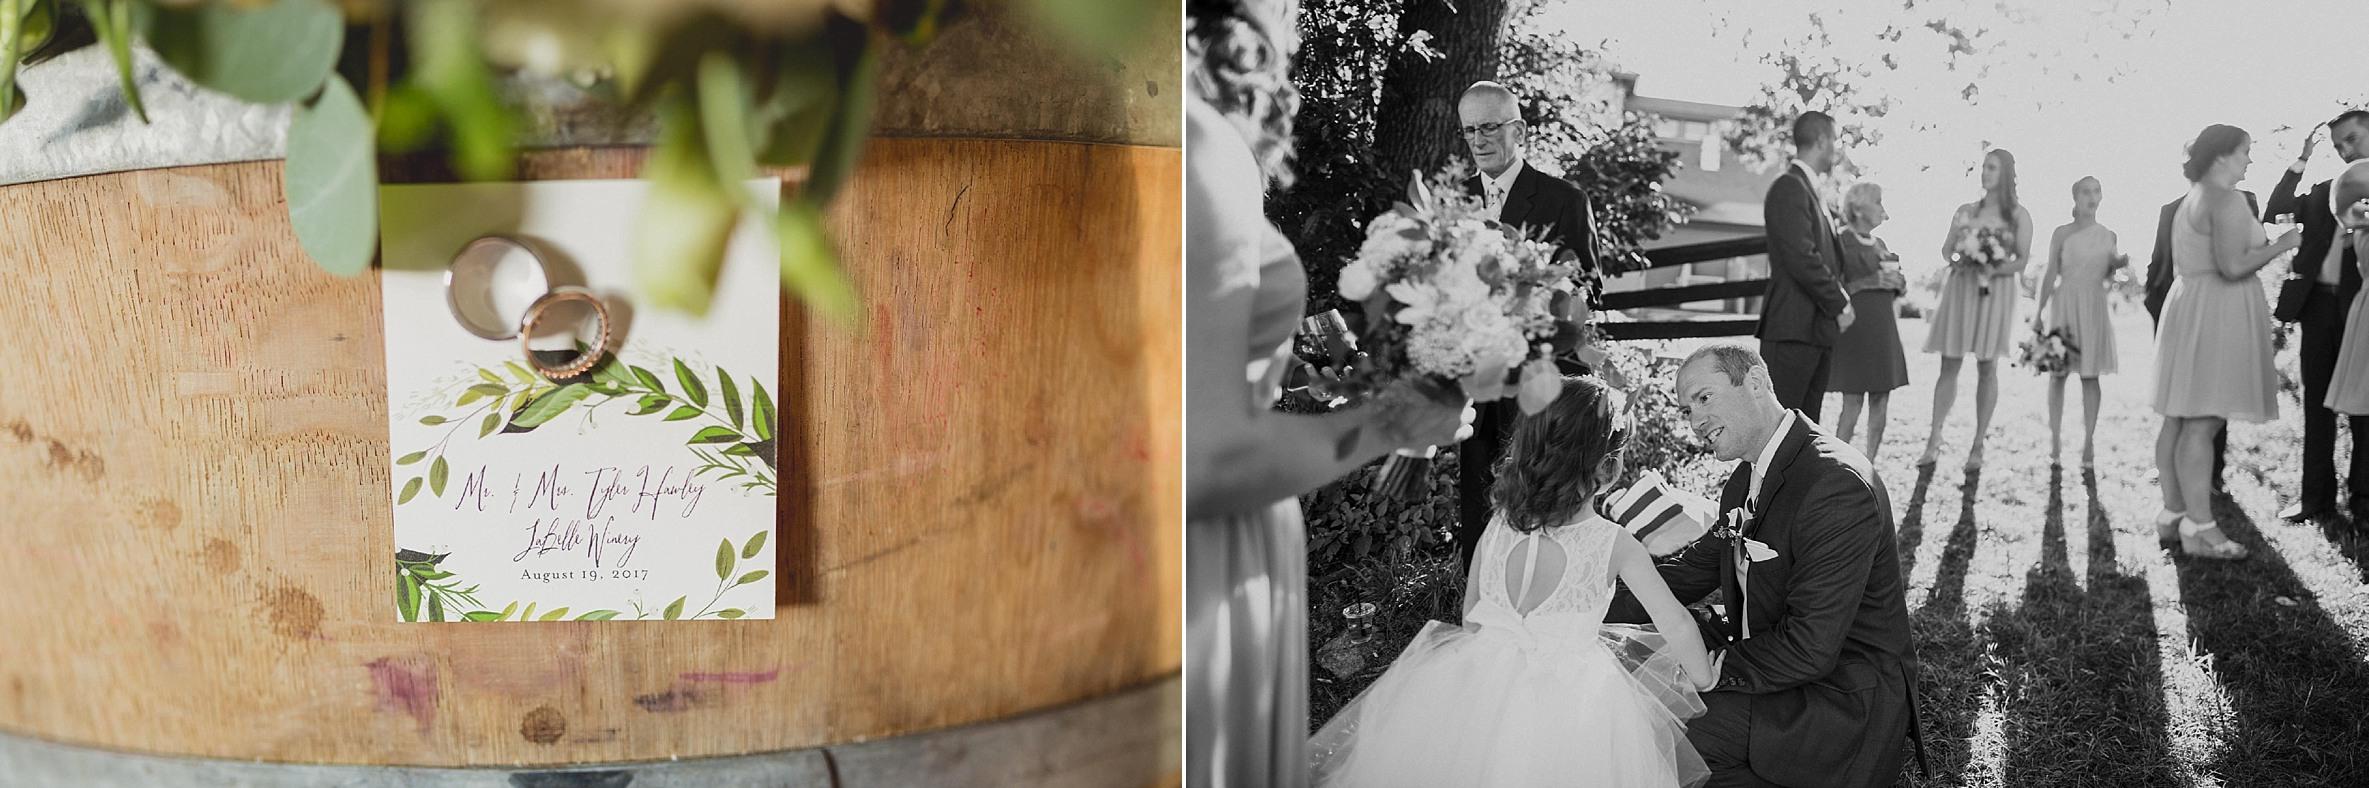 labelle winery wedding-24.jpg